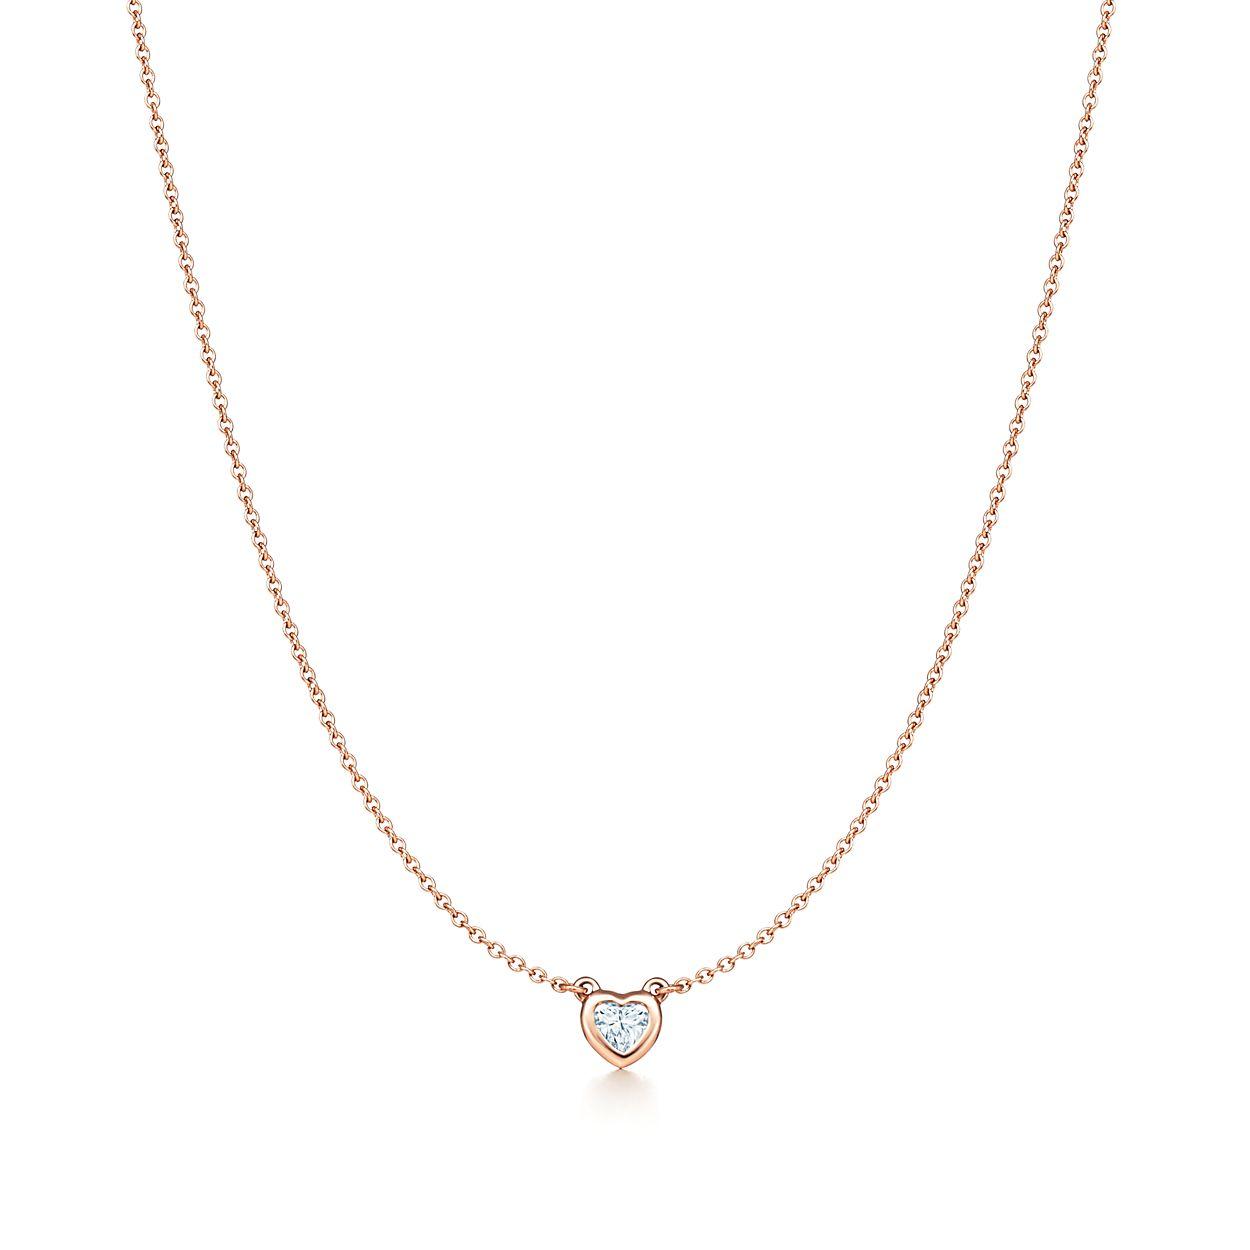 Elsa peretti diamonds by the yard heart necklace in 18k rose gold elsa perettidiamonds by the yard heart necklace aloadofball Choice Image